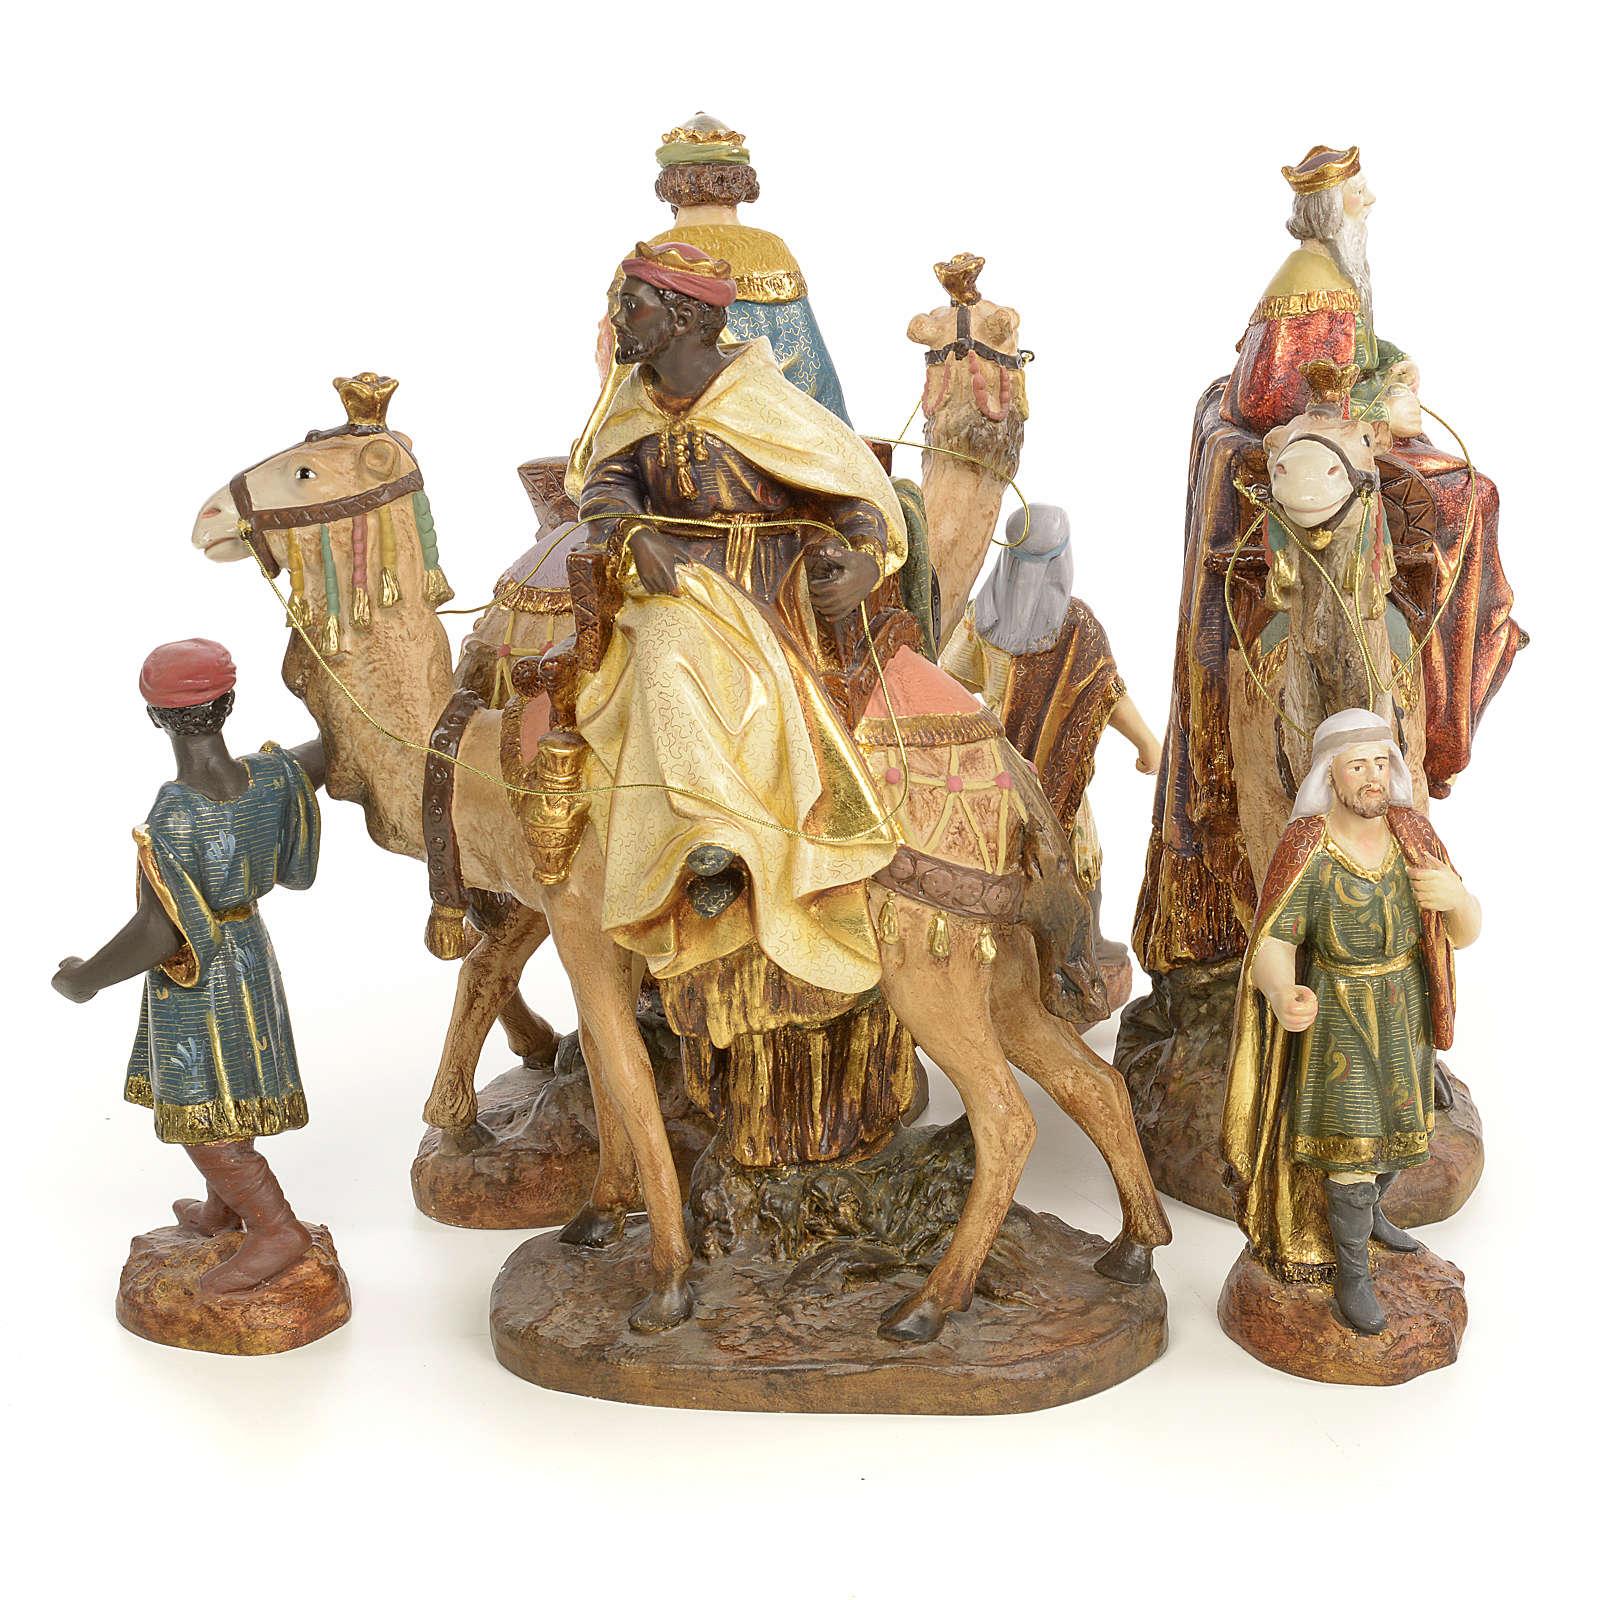 Tre Re Magi a cammello 20 cm pasta di legno dec. extra 3